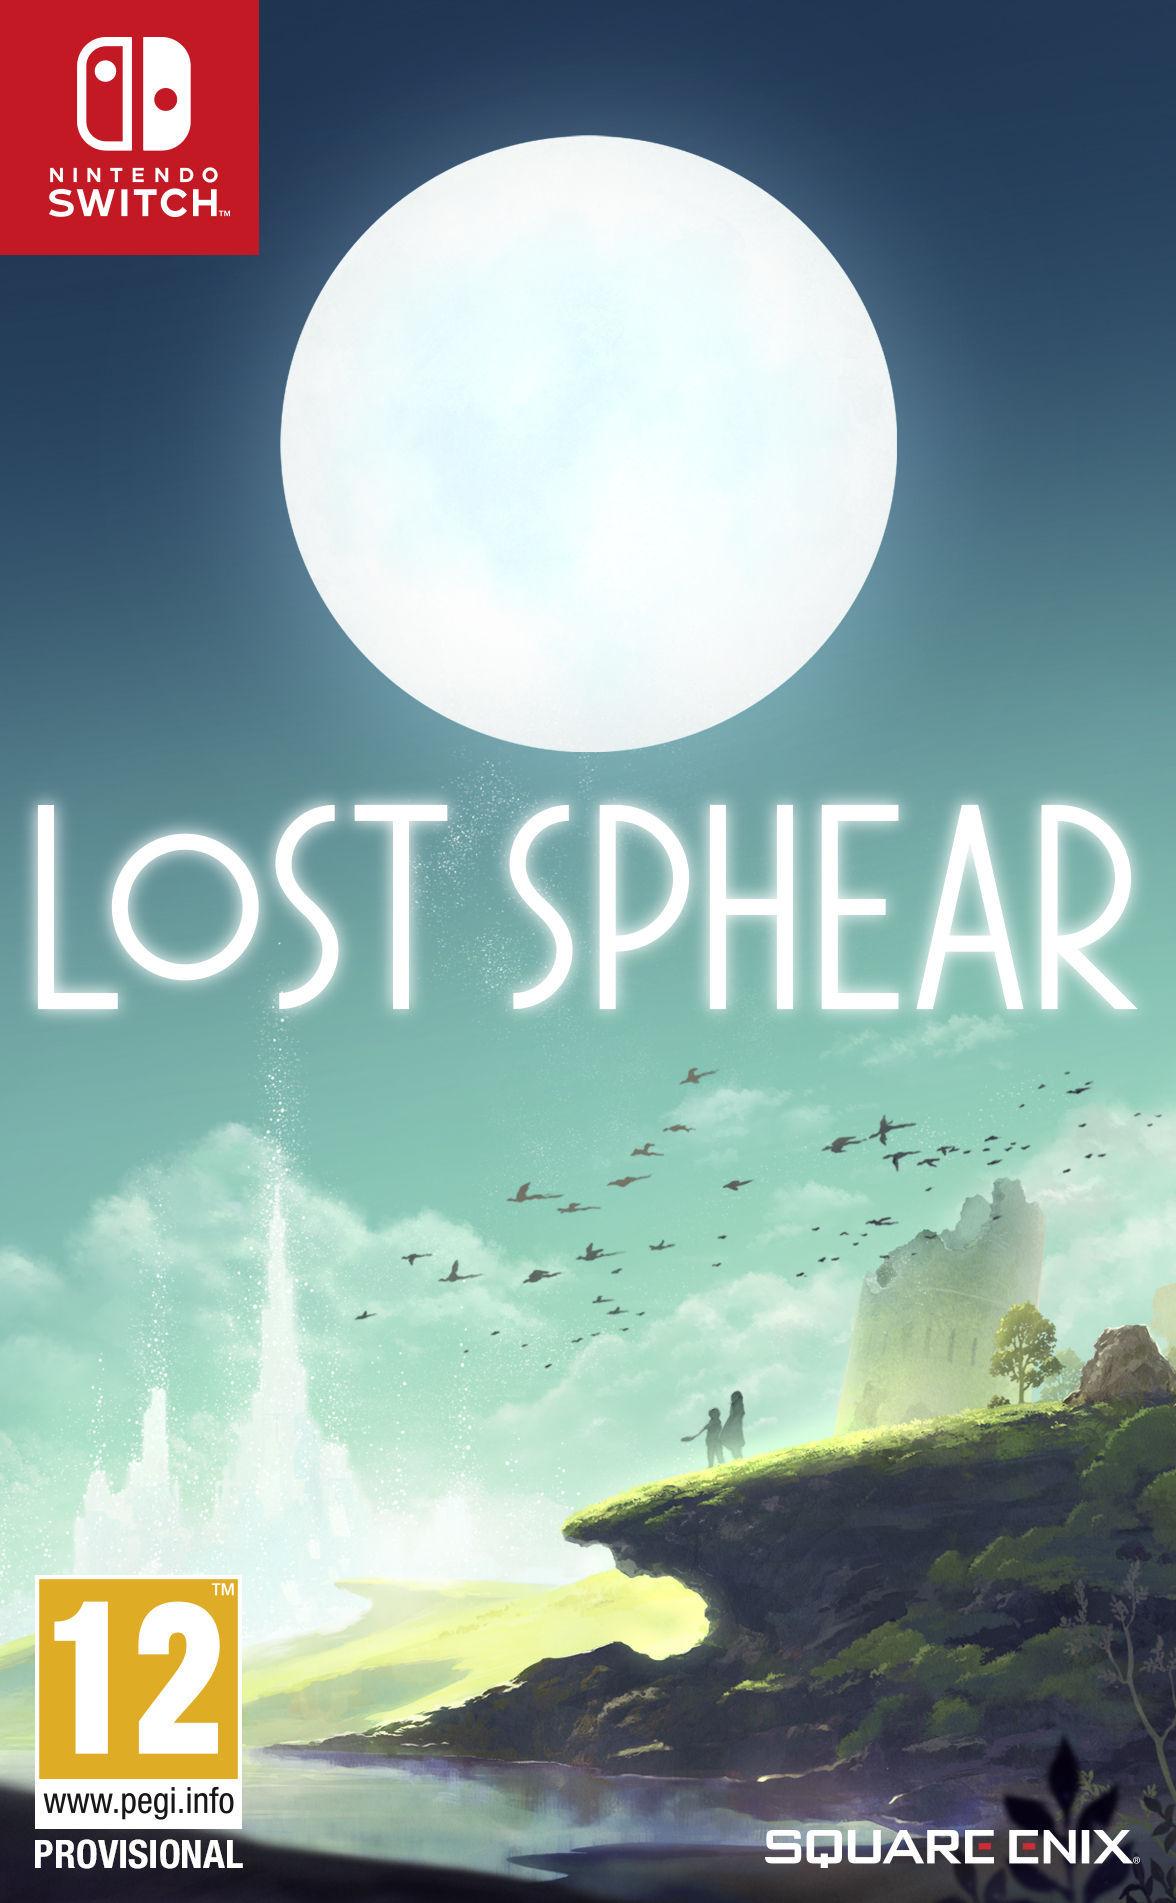 Imagen 106 de Lost Sphear para Nintendo Switch